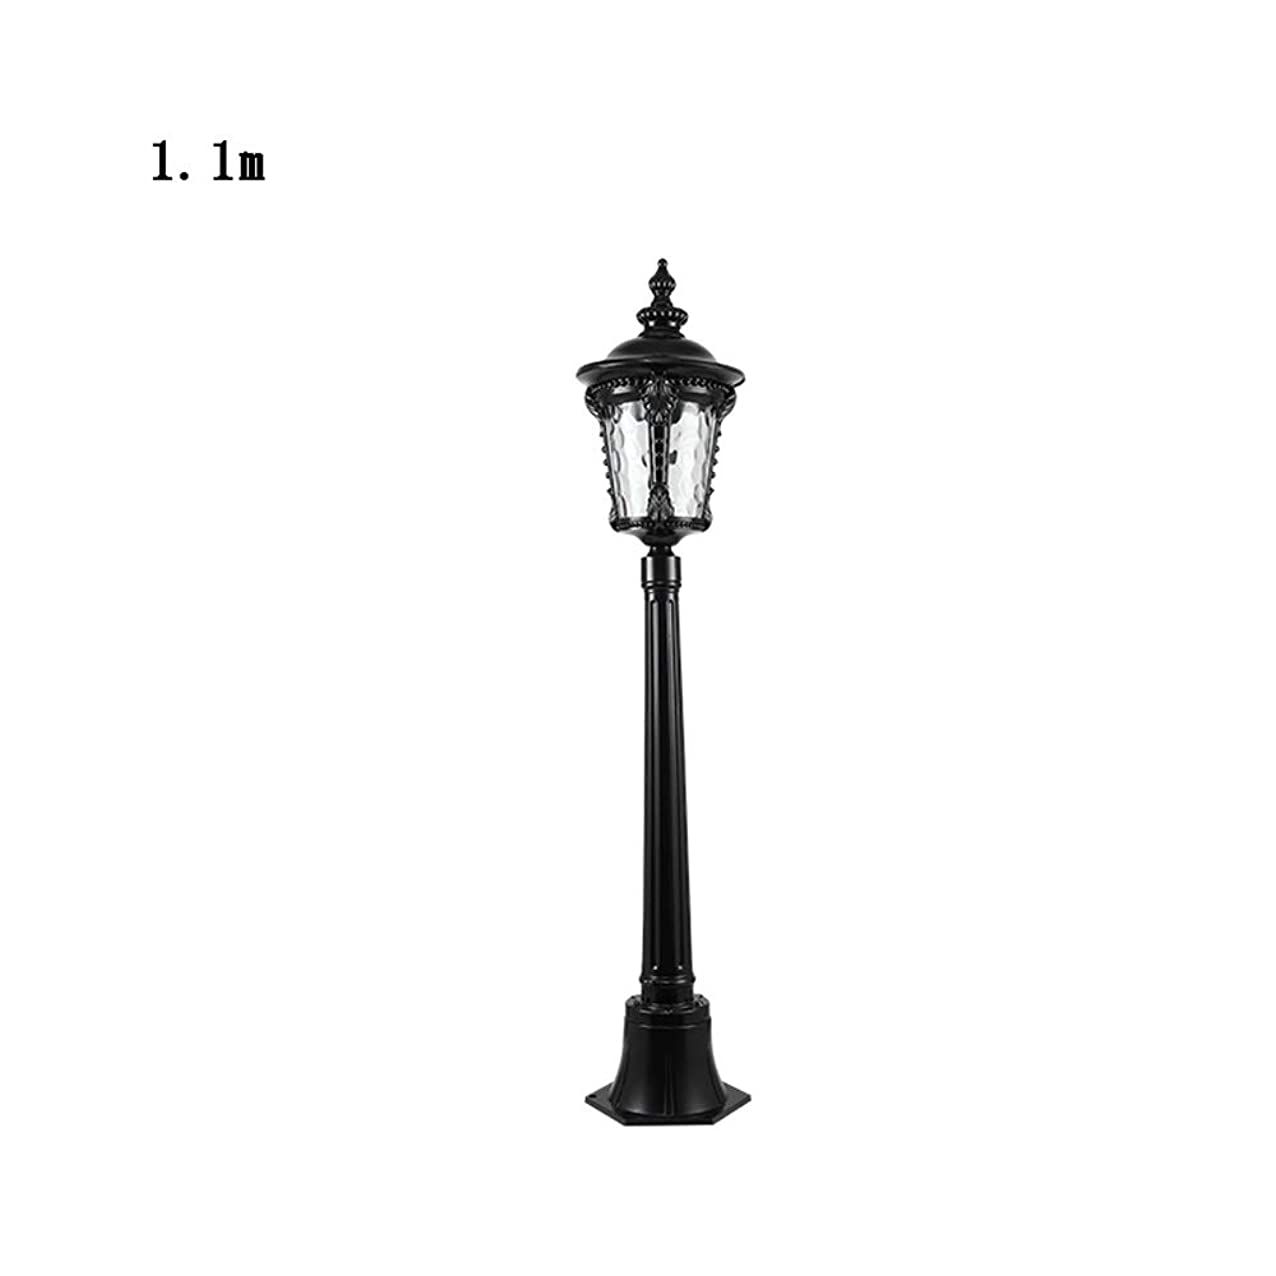 Meidn Luxury Colonial Outdoor High Pole Pillar Post Light 1-Light Traditional Garden Glass Lantern Column Lamp Water-Proof Cast Aluminum Housing Villa Patio Pool Landscape E26/E27 Lighting acaiaxduyqttj397